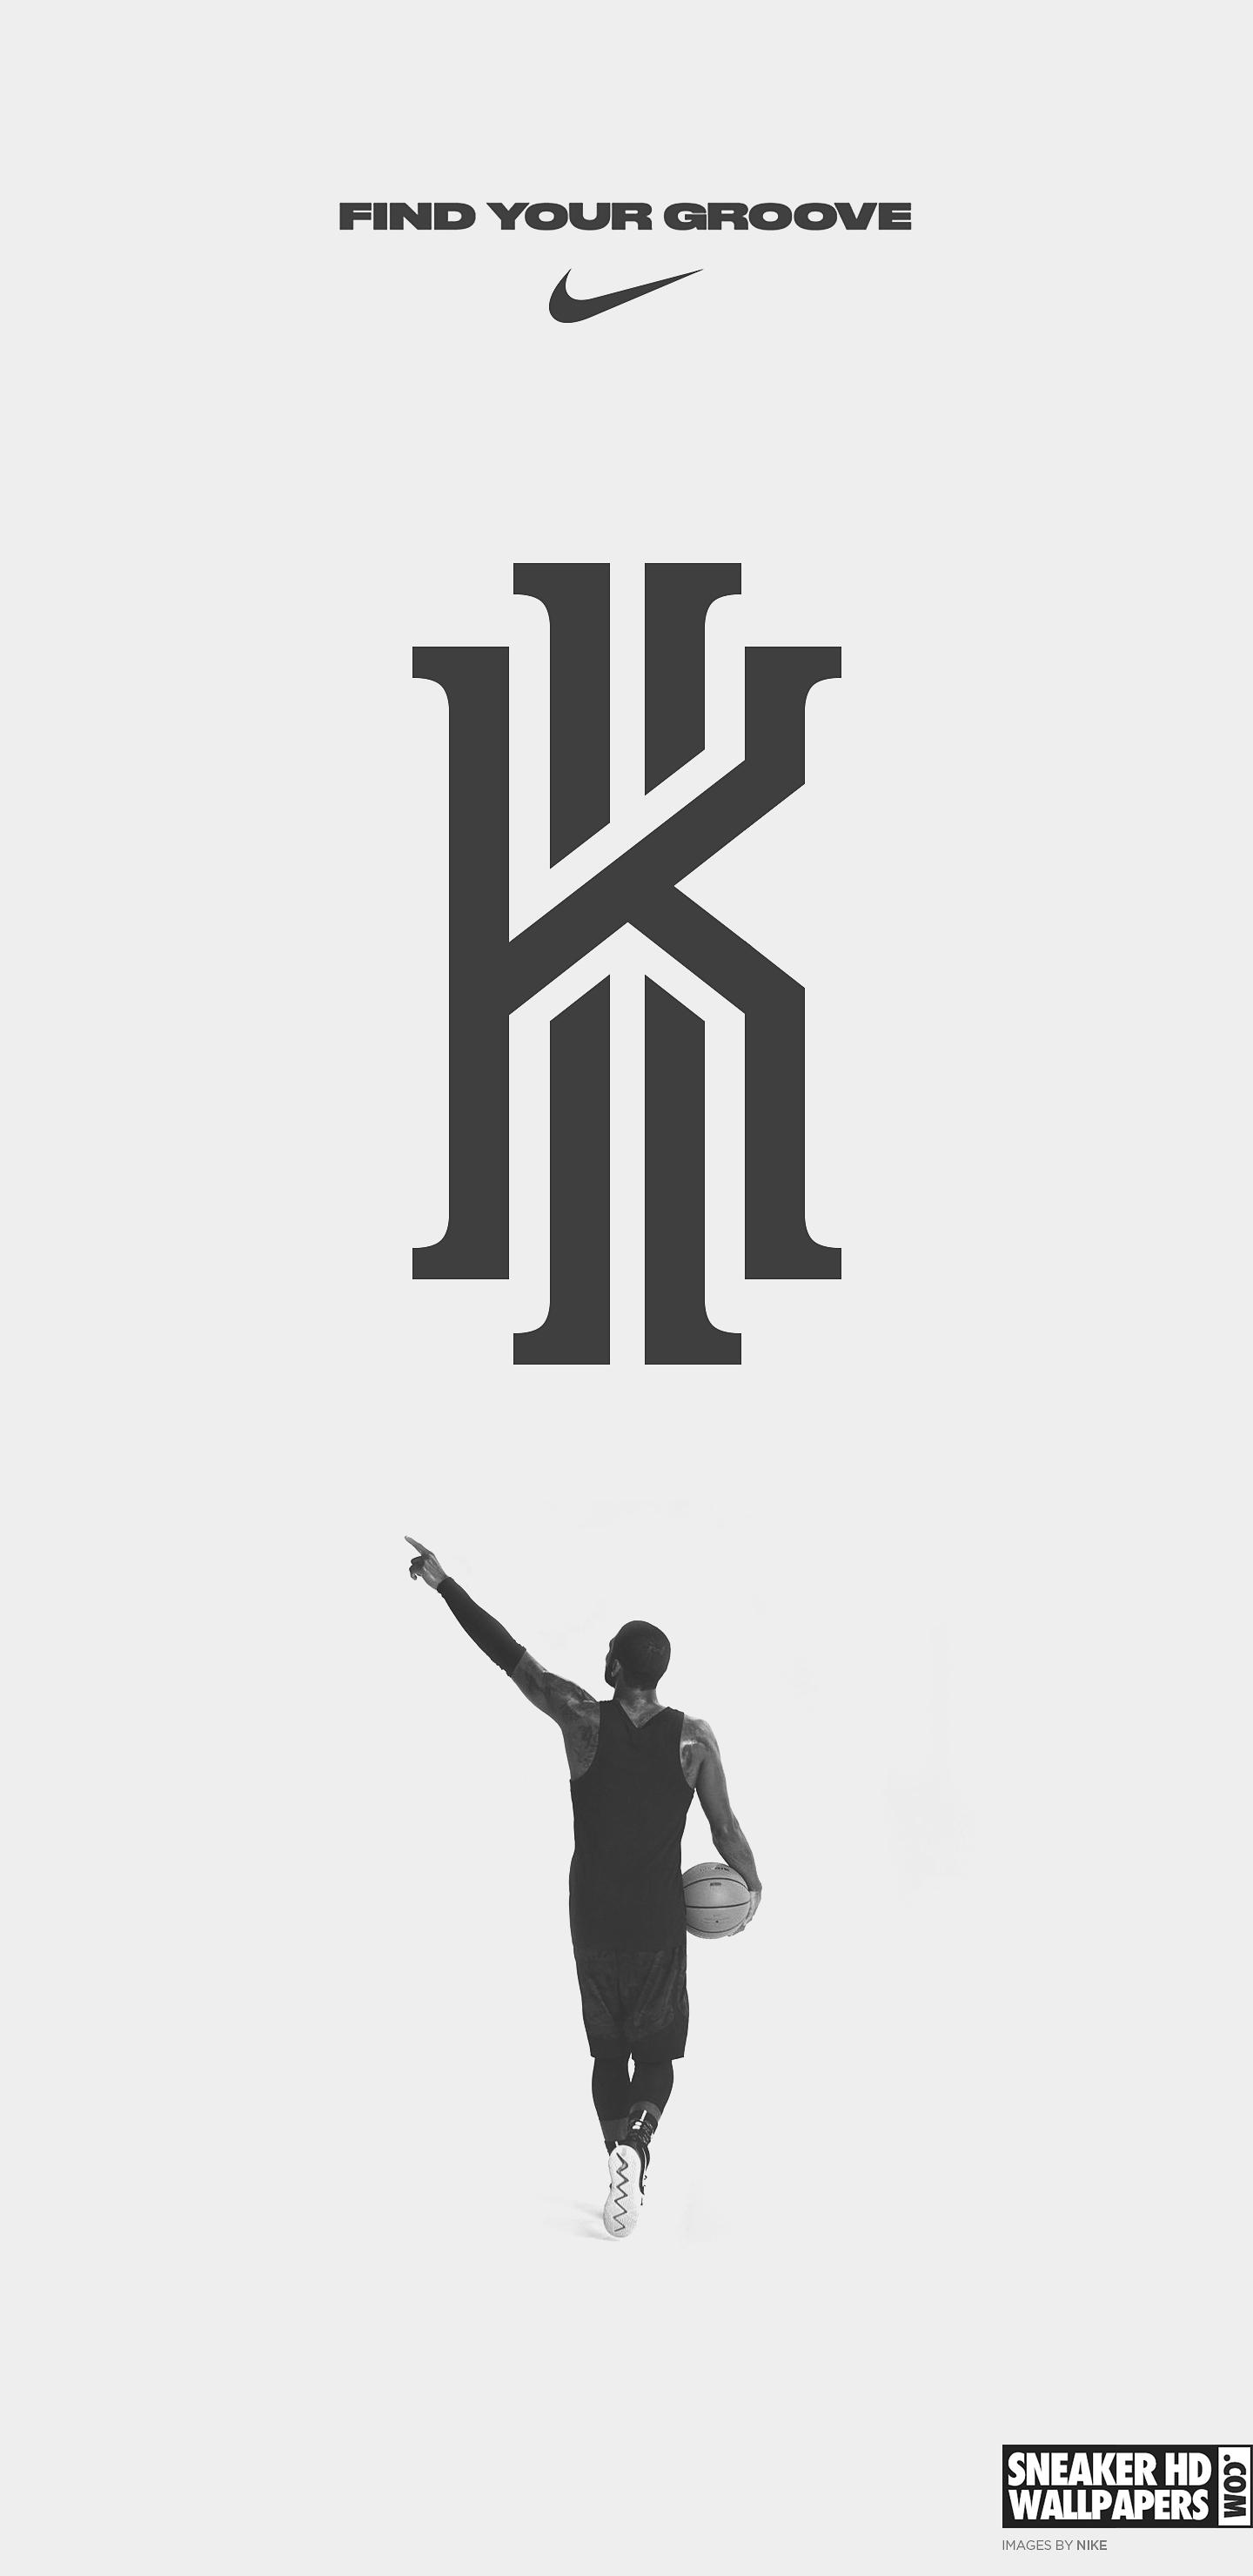 Adidas Logo Wallpaper Iphone Sneakerhdwallpapers Com Your Favorite Sneakers In Hd And